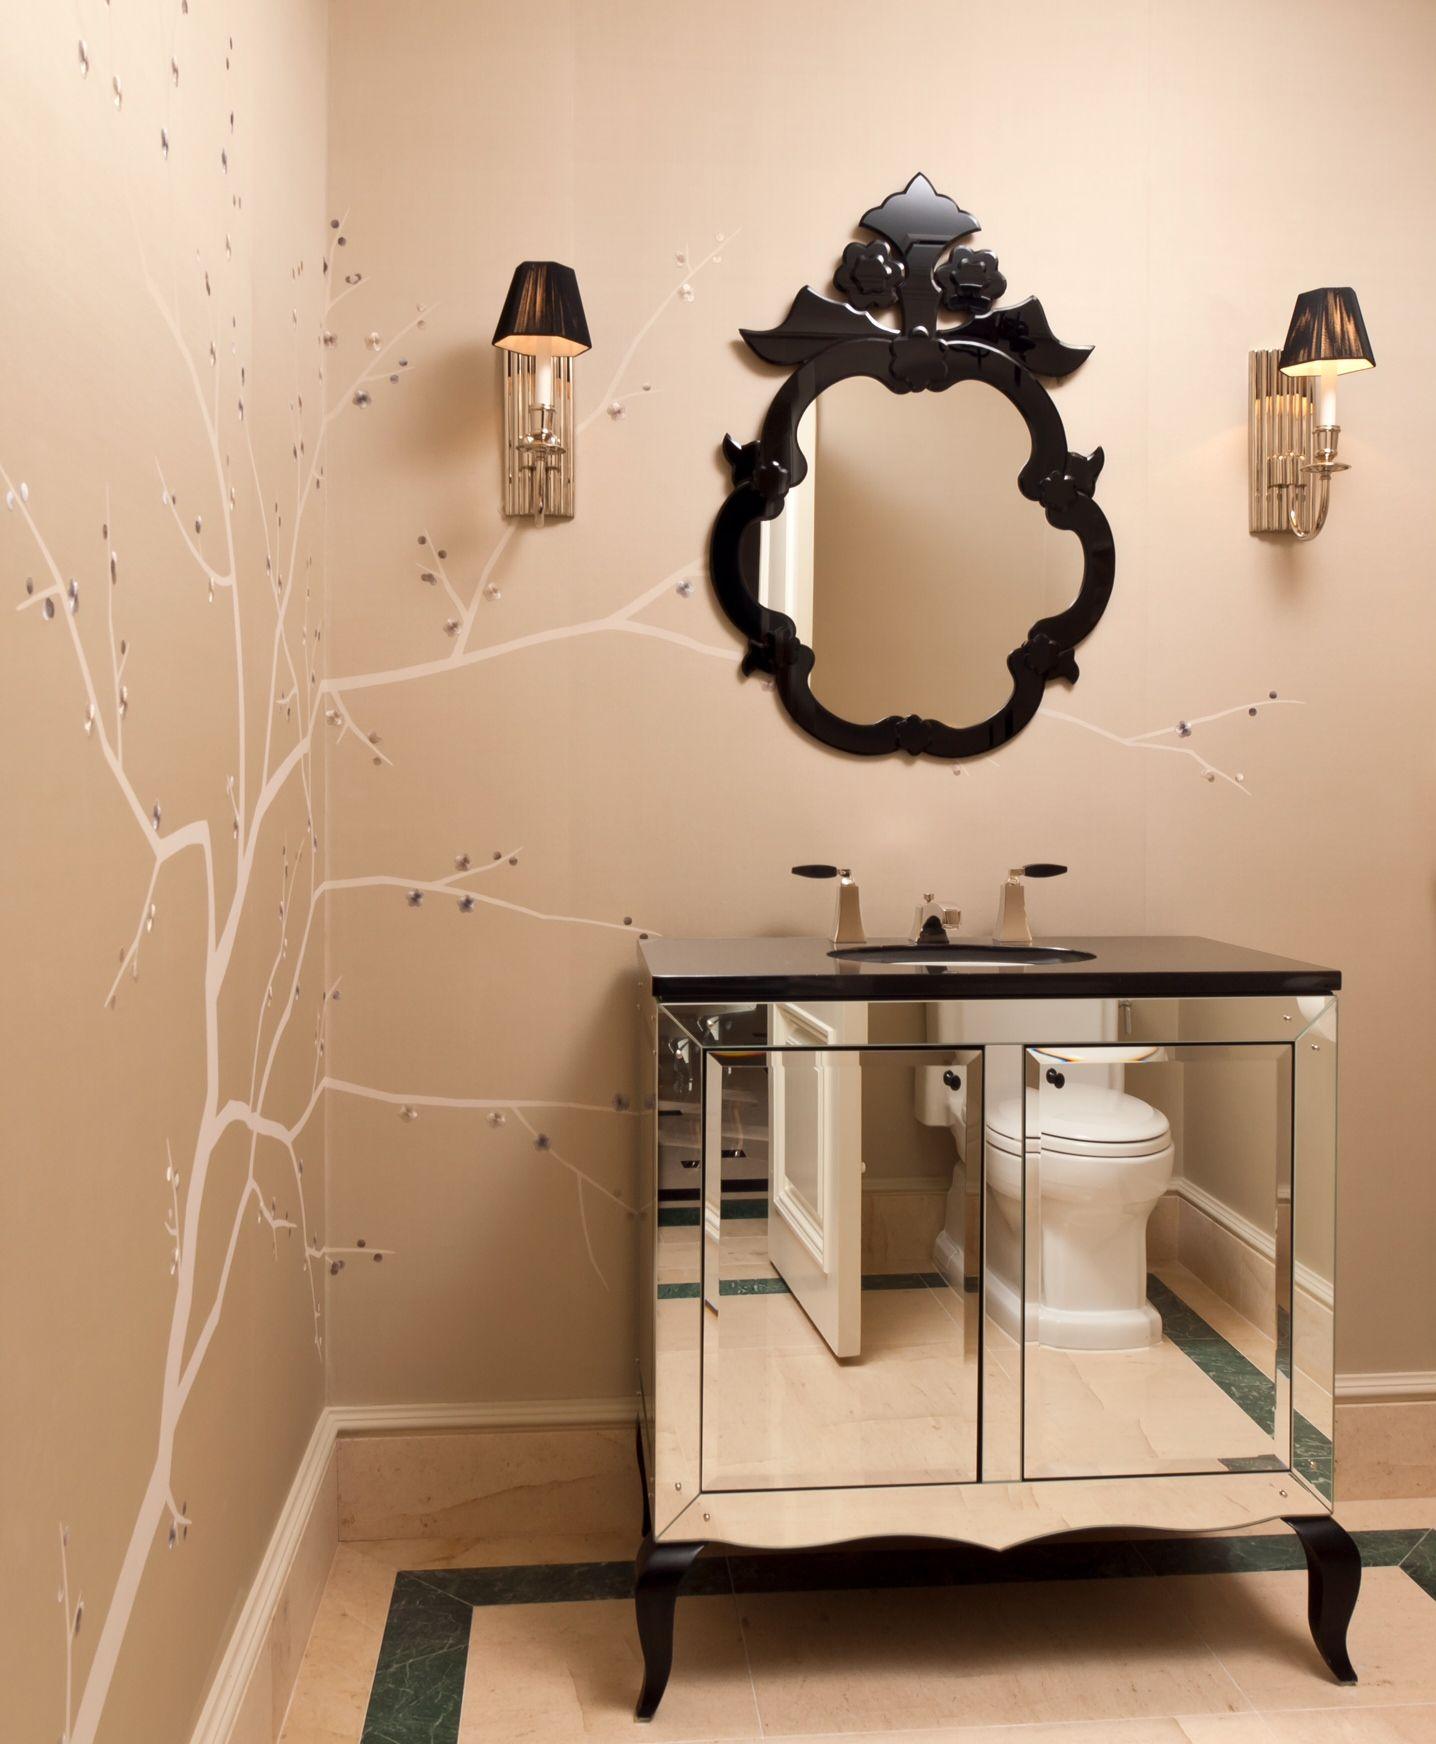 CEBULA DESIGN: Powder Room in Marshall, VA. #cebuladesign #powderroom #interiordesign #allswellthatendswell